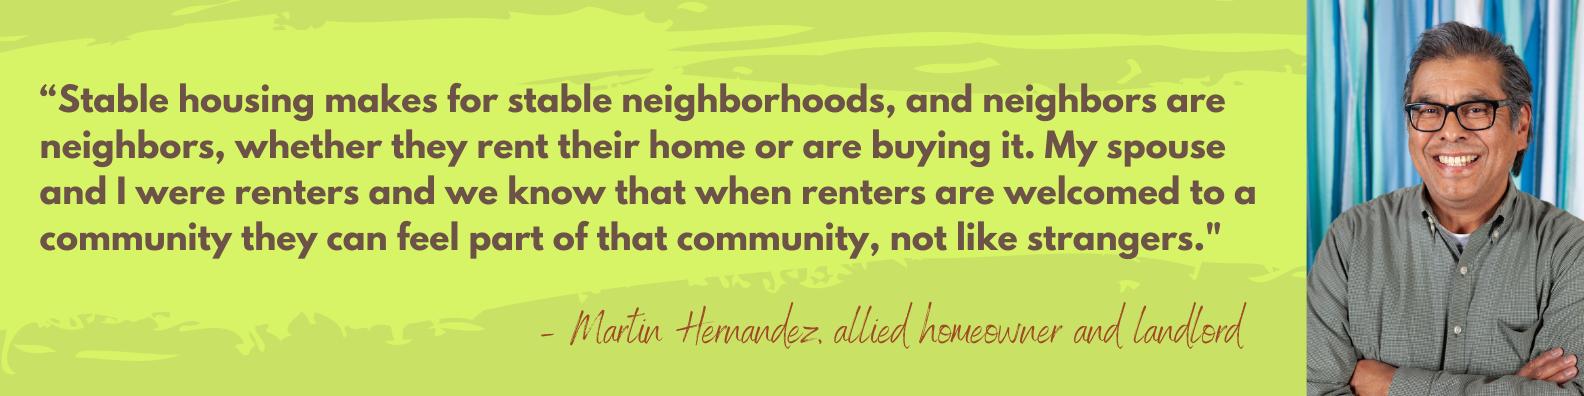 Martin Hernandez quote